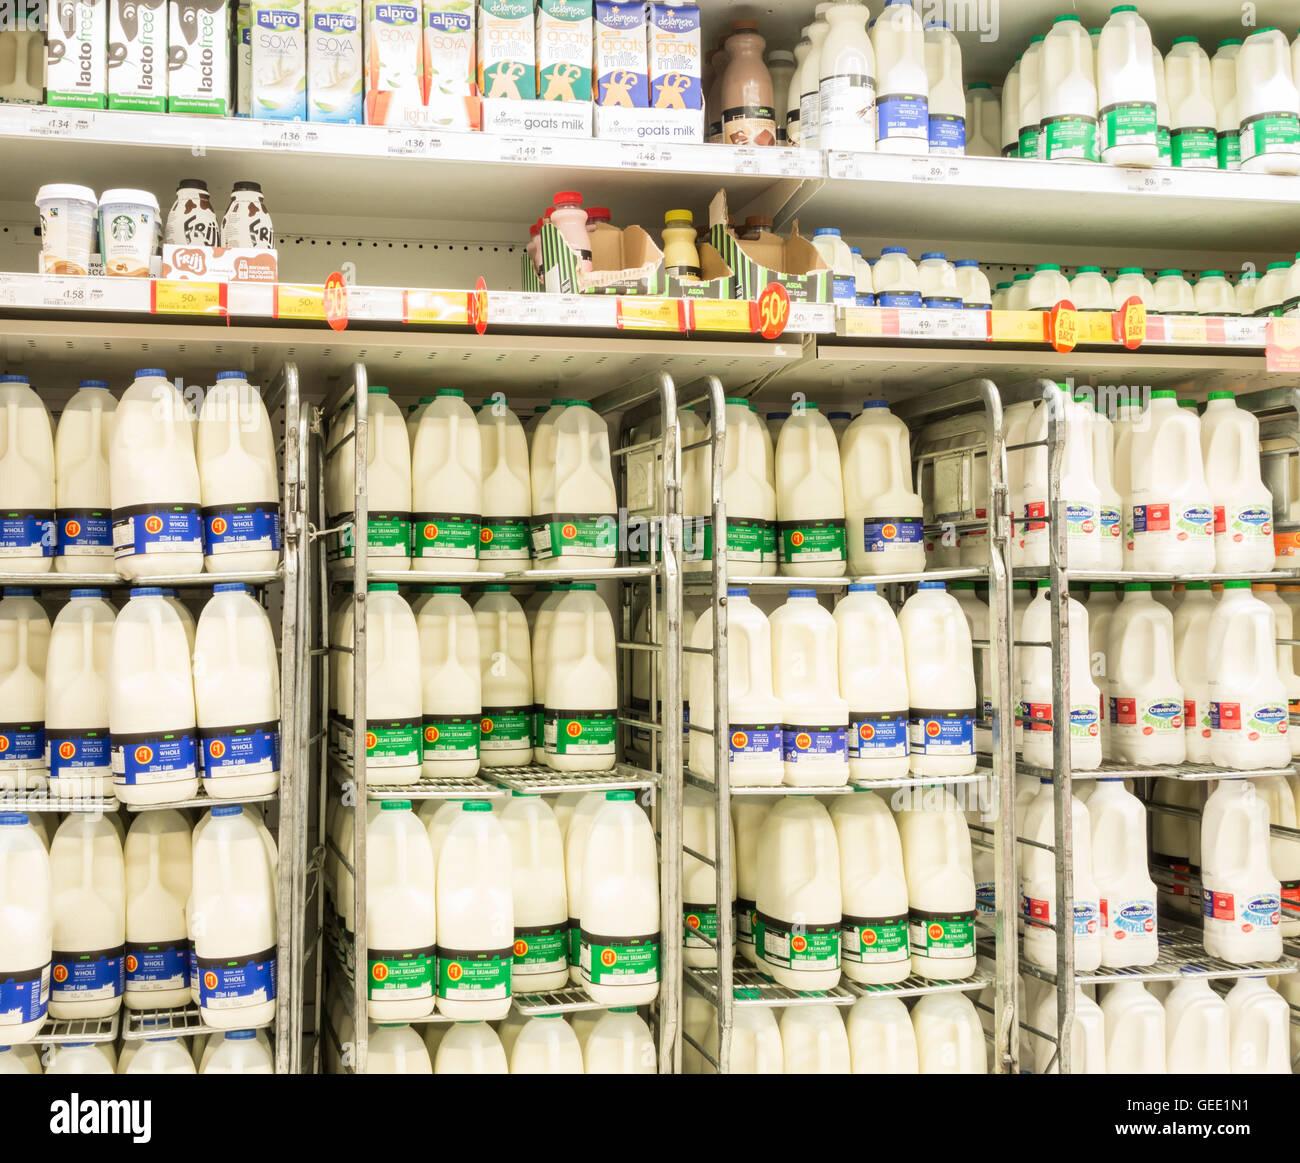 Milk Supermarket Uk Stock Photos Milk Supermarket Uk Stock Images